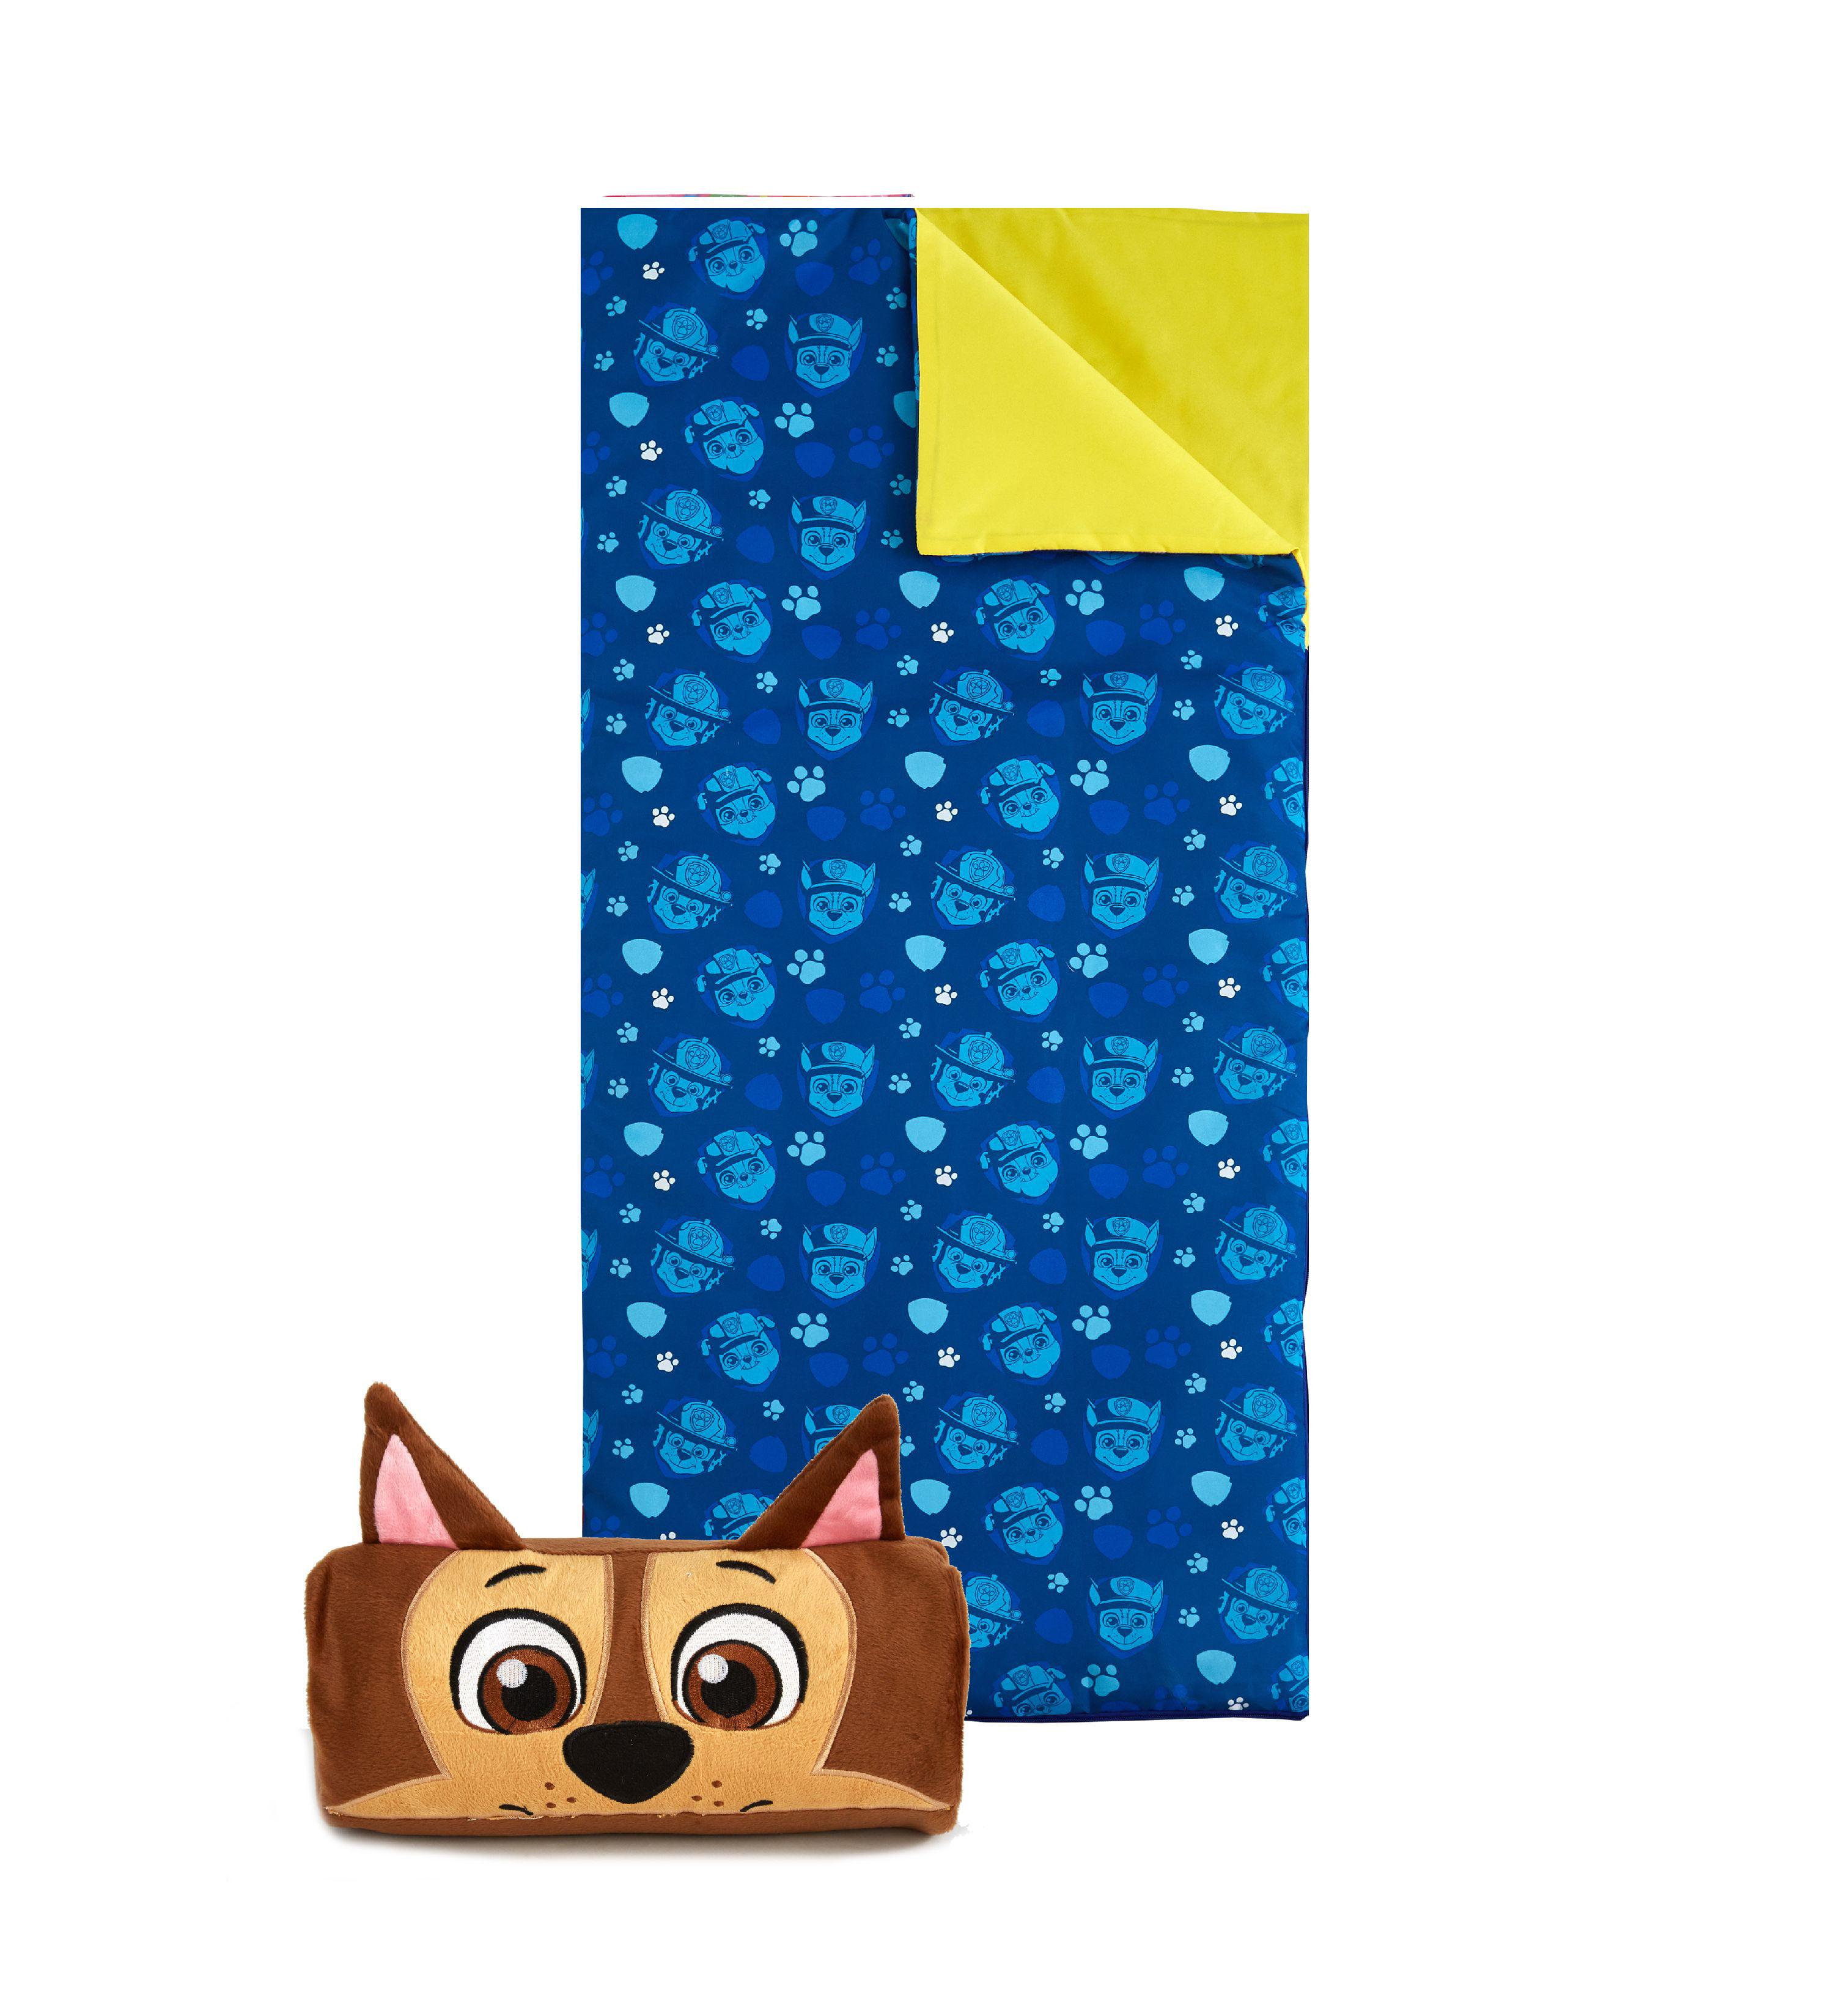 Nickelodeon Paw Patrol Nap Mat with BONUS carry bag